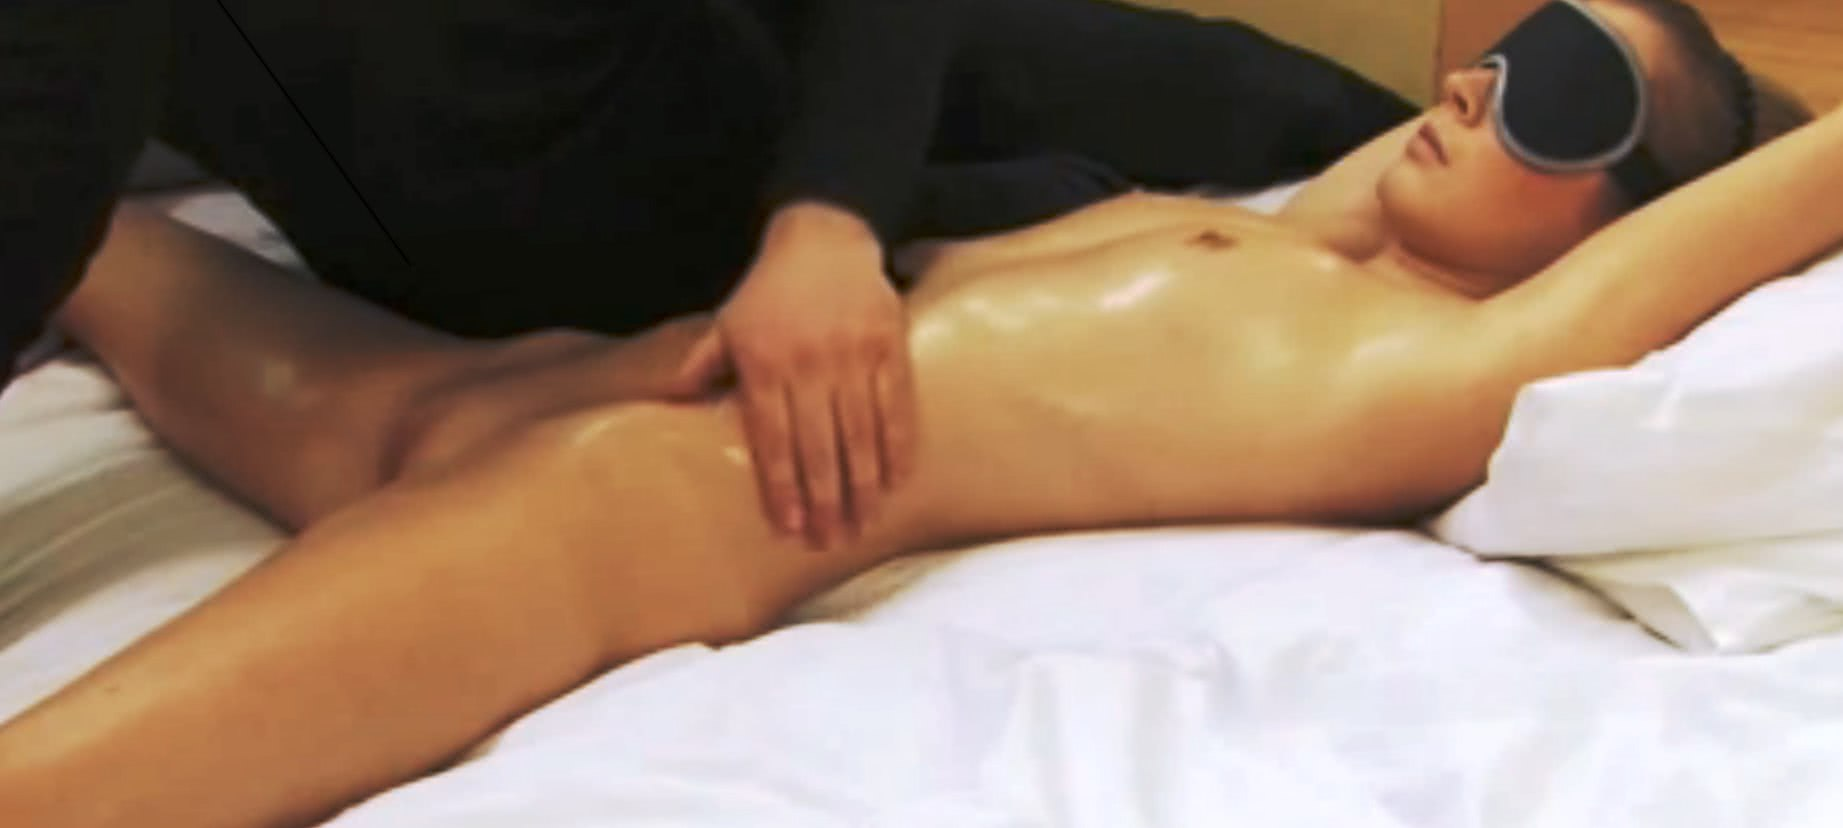 Лечебно эротический массаж индивидуалки проспекта мира